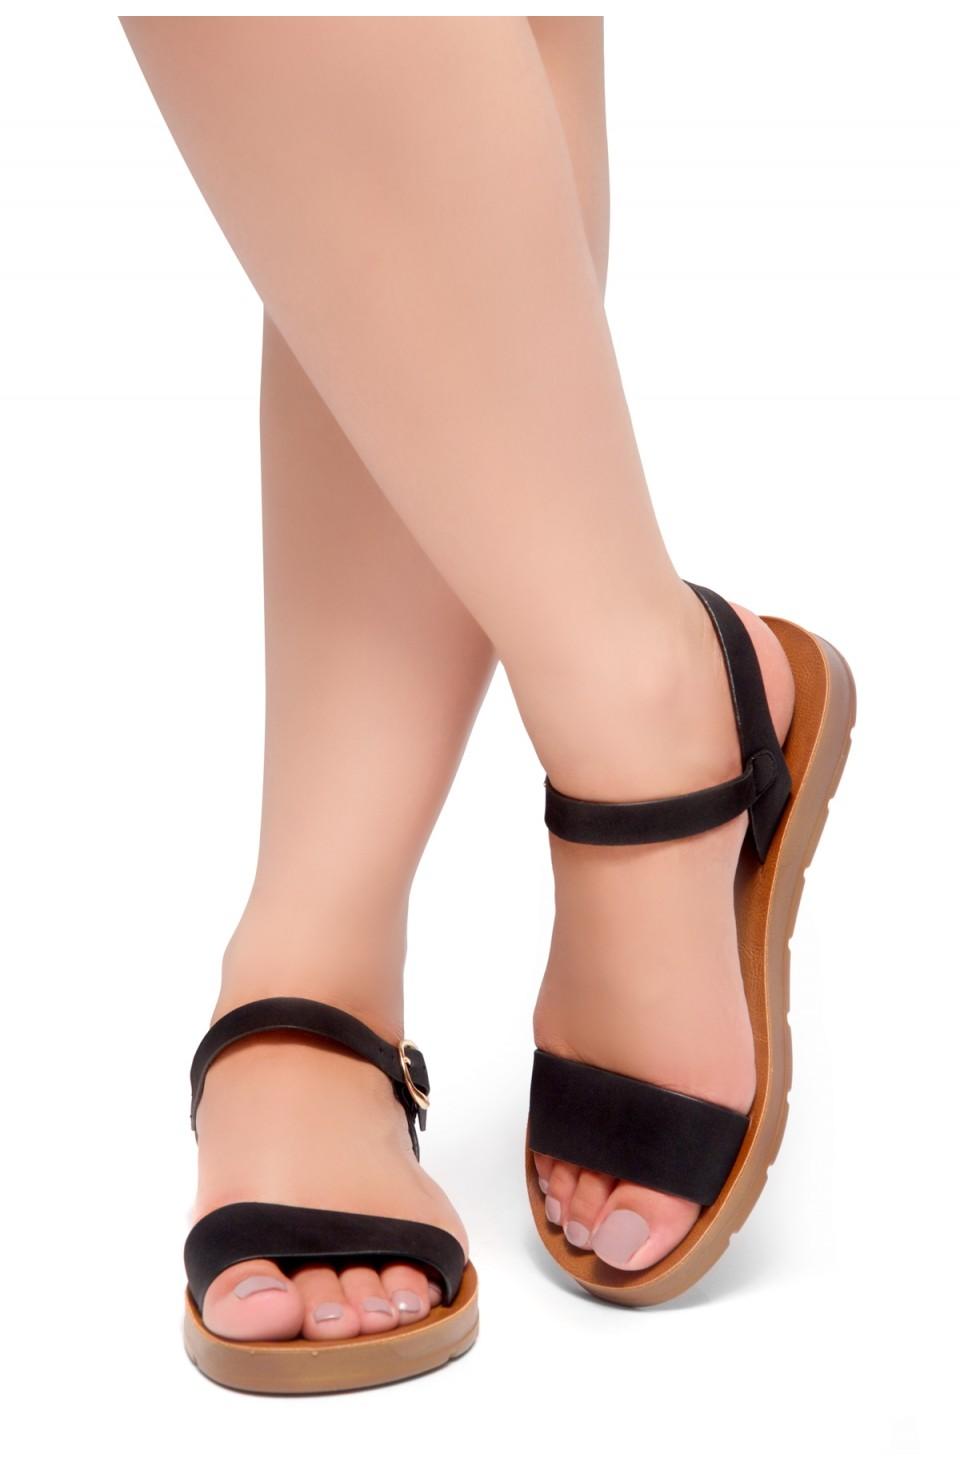 Shoe Land Monday-Women's Open Toe One Band Ankle Strap Flat Sandals (Black)